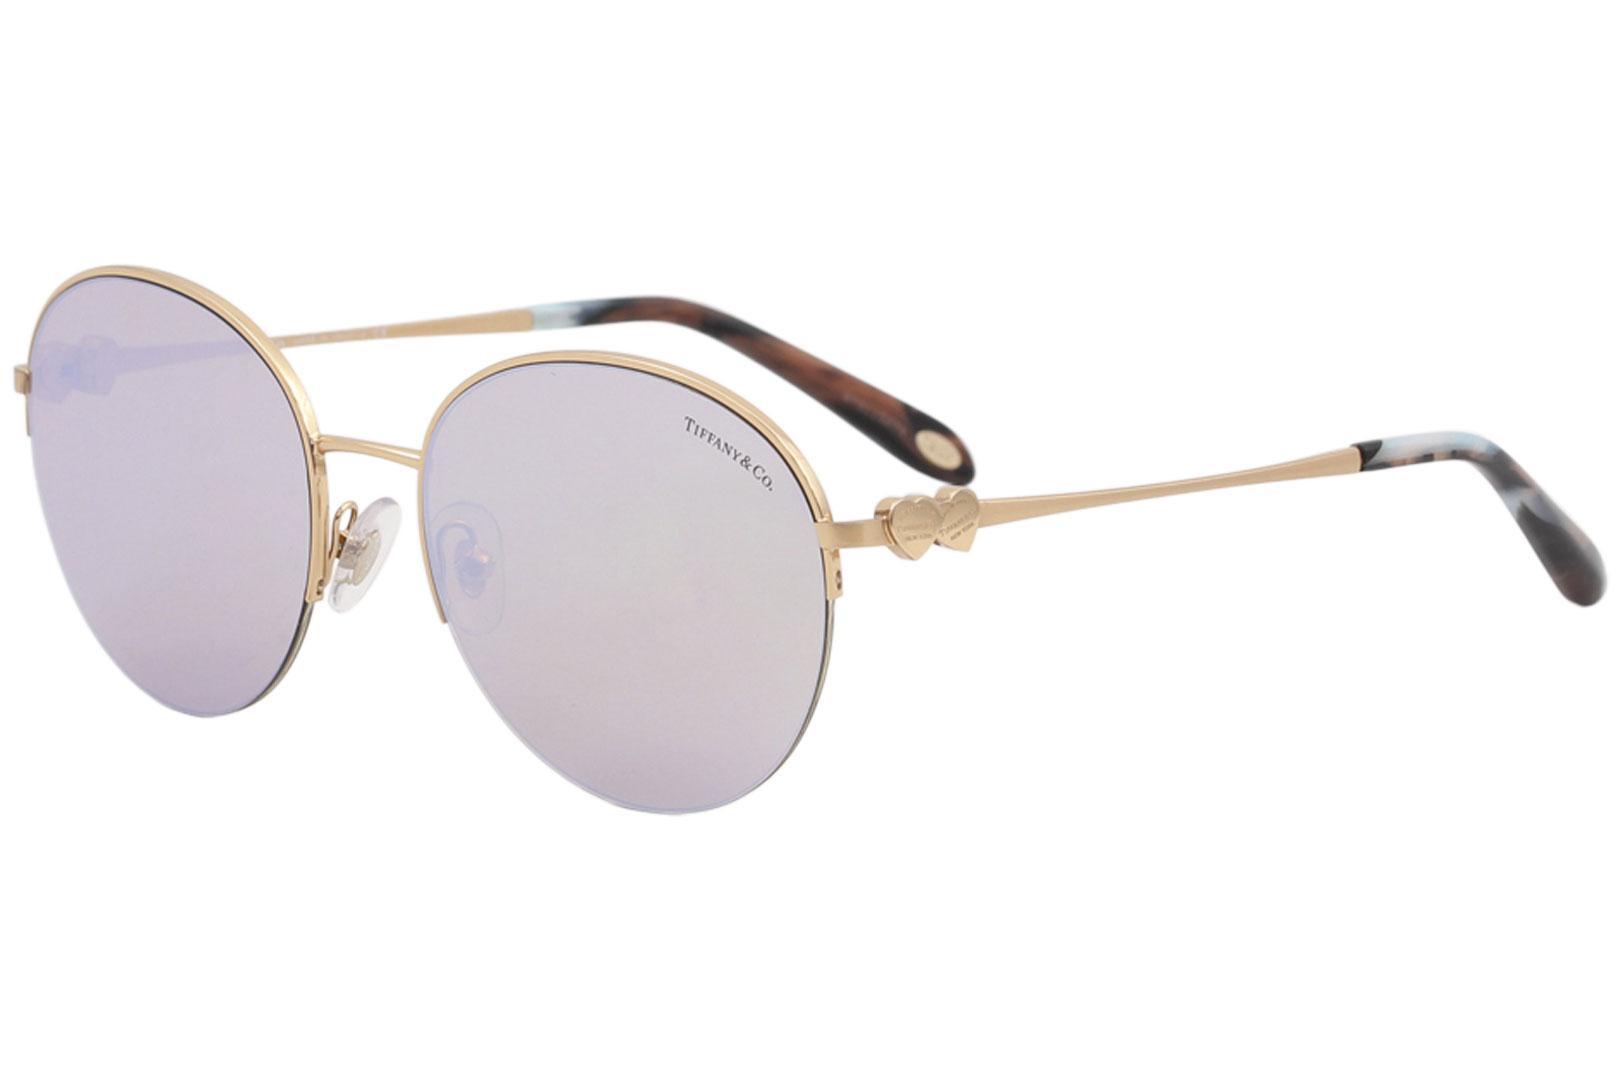 2d3d771409 Tiffany   Co Women s TF3053 TF 3053 Fashion Round Sunglasses